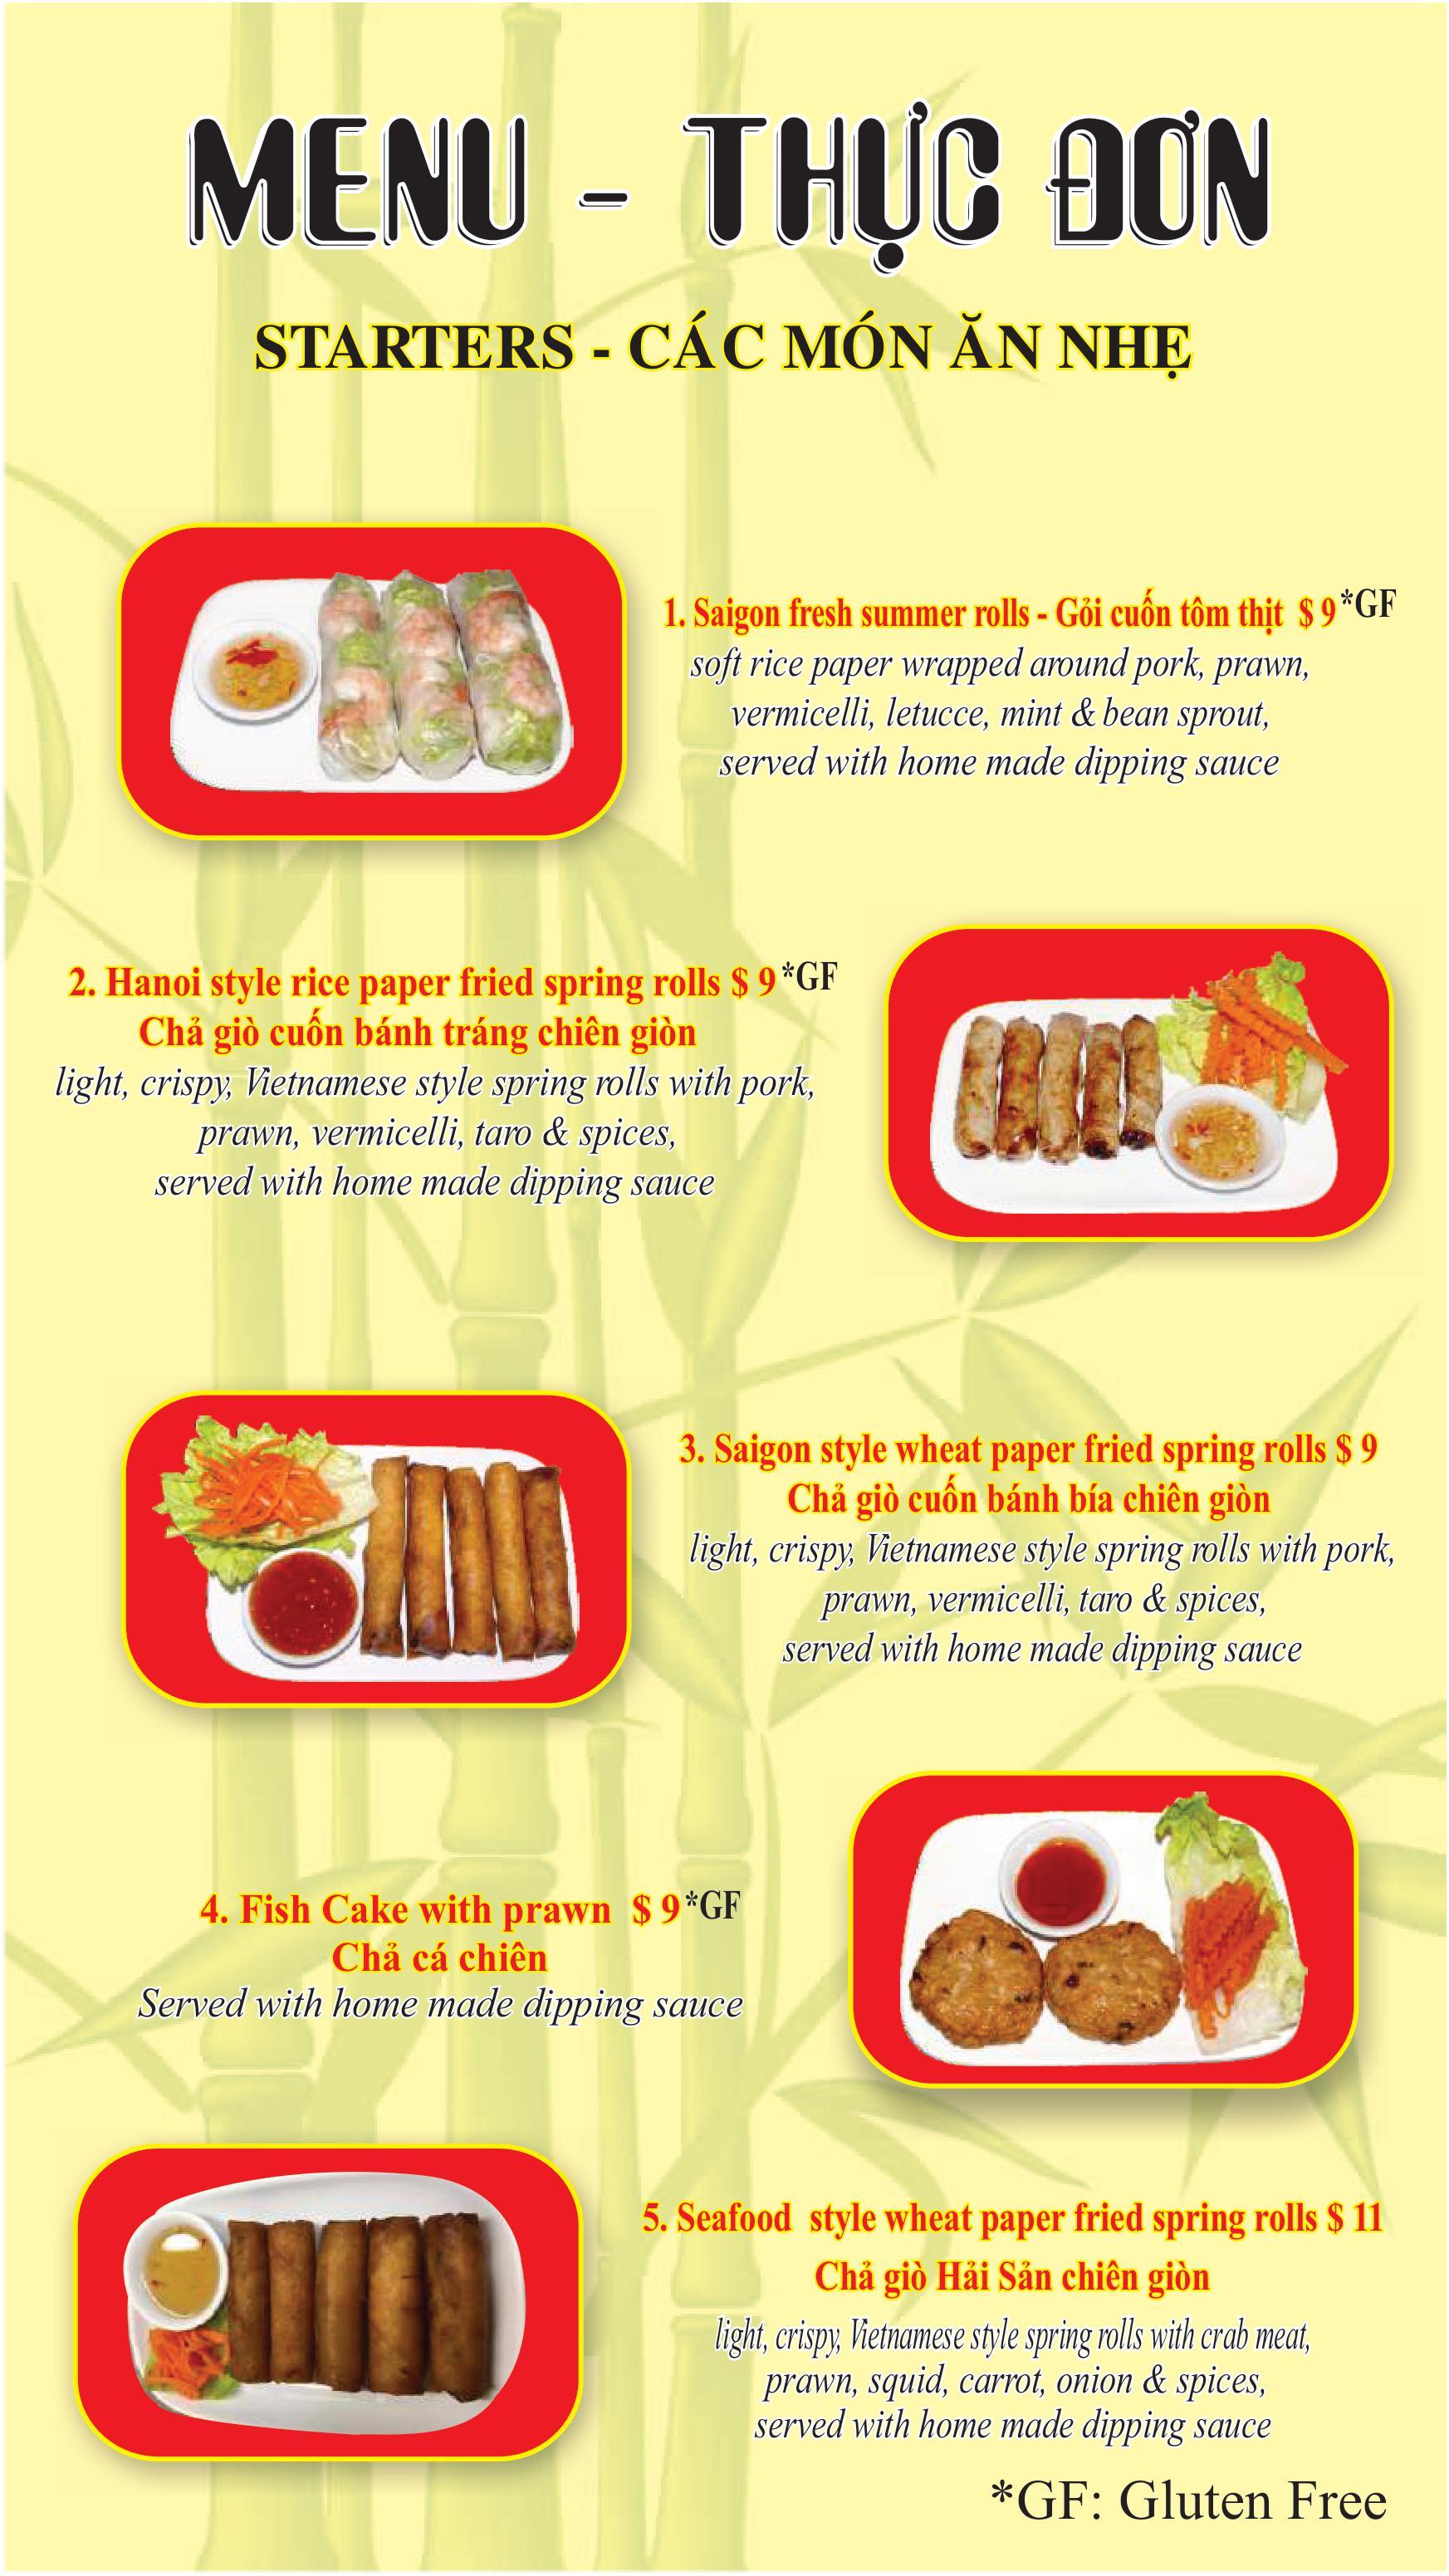 Starters menu